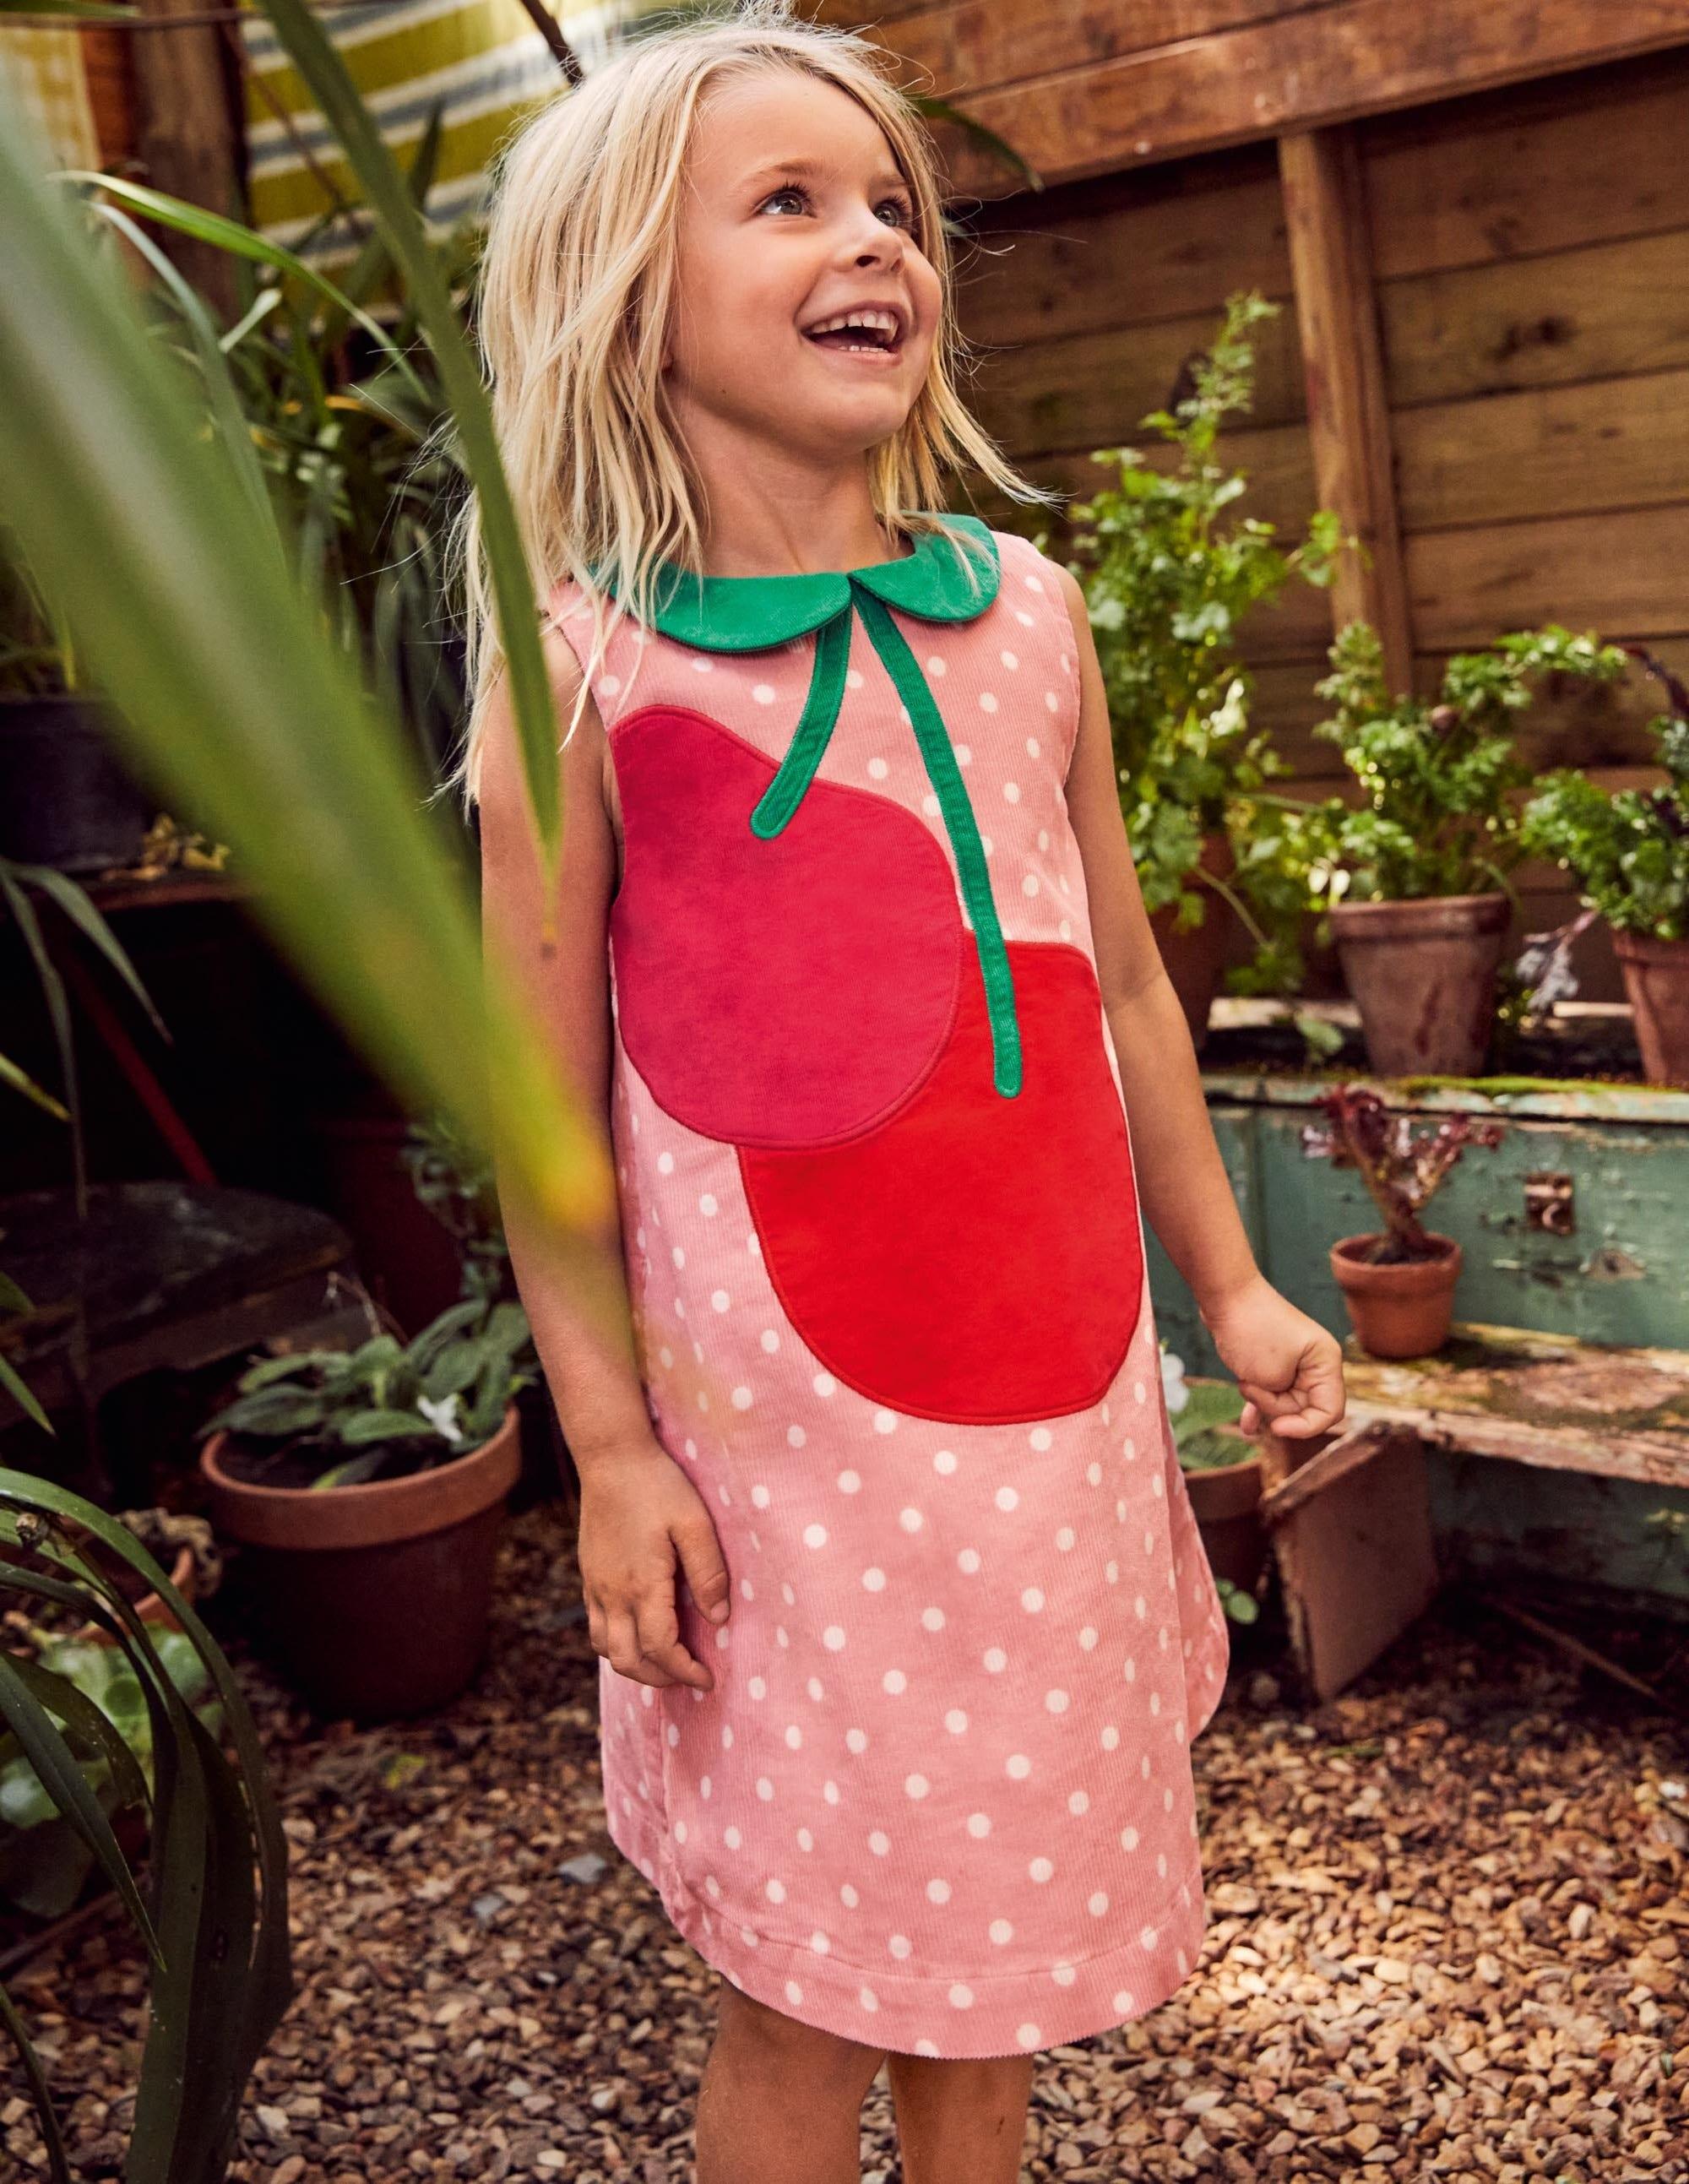 Boden Cord Applique Shift Dress - Boto Pink Cherry